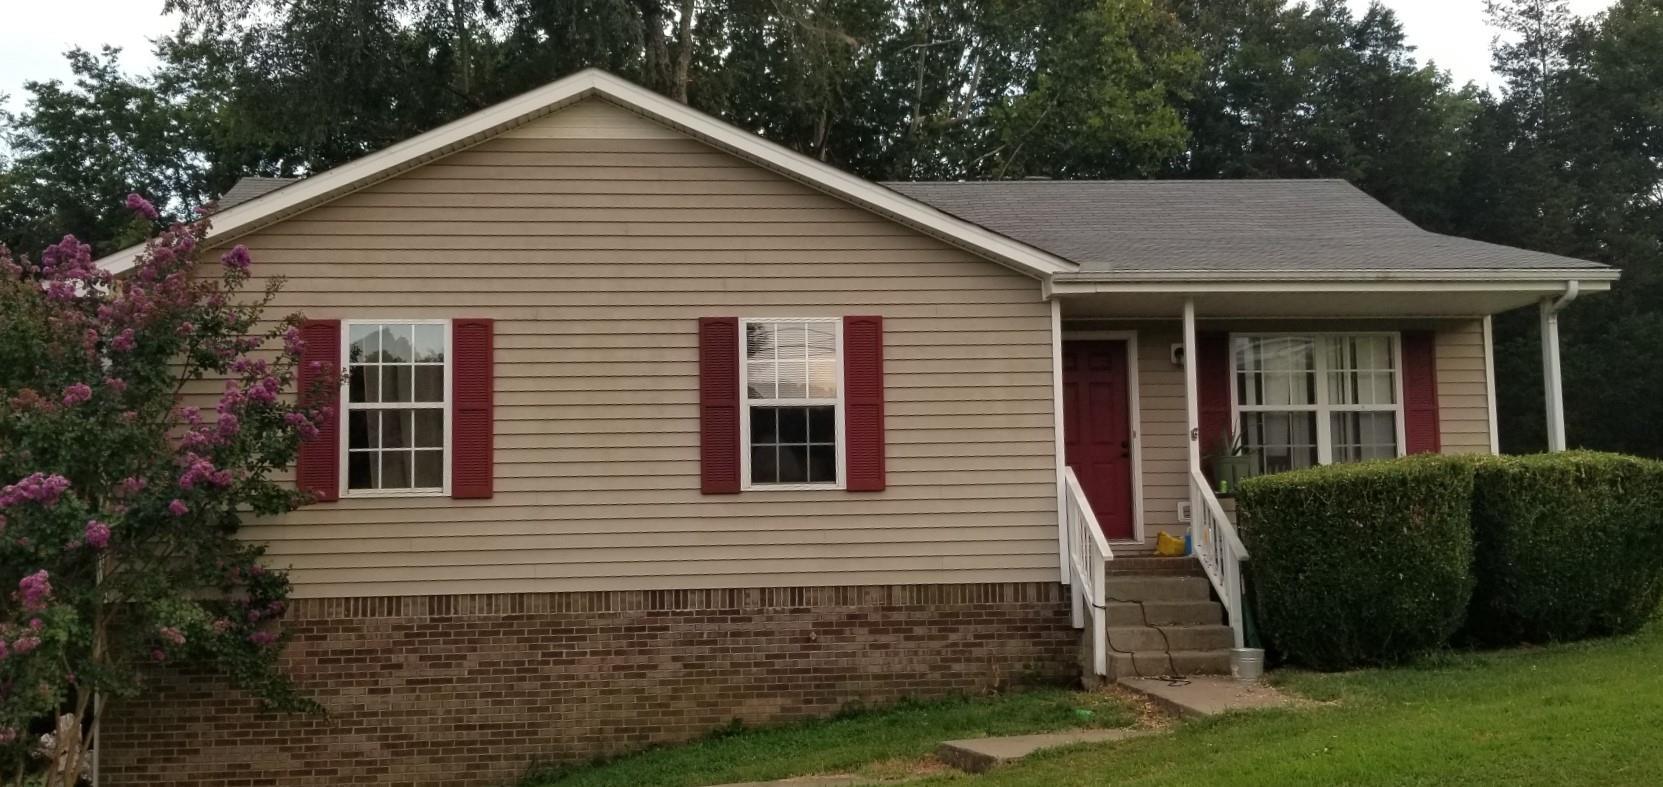 3402 Timber Trce, Woodlawn, TN 37191 - Woodlawn, TN real estate listing